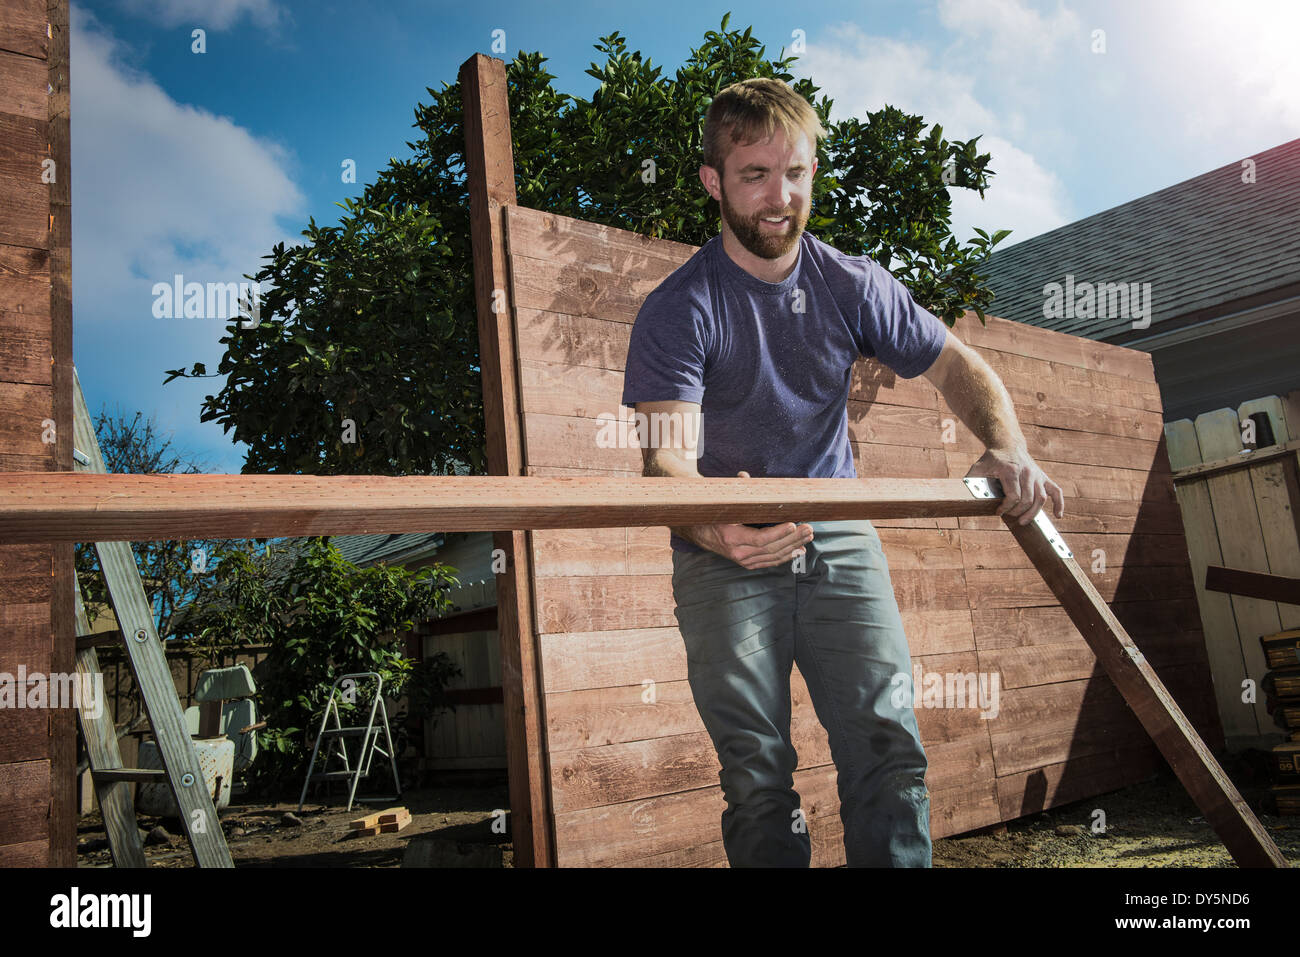 Joiner in backyard lifting wood framework Stock Photo